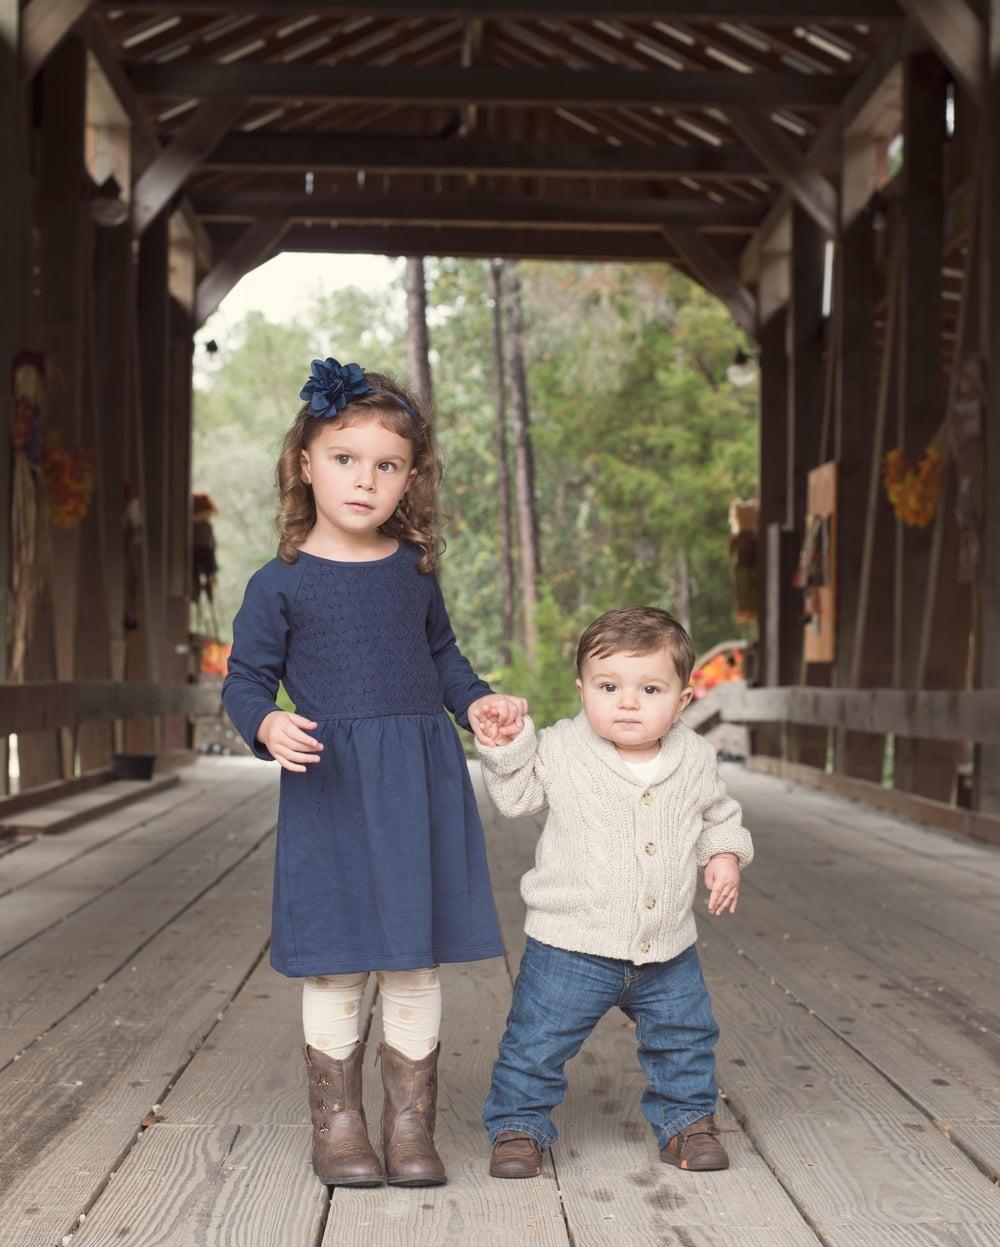 candice-brown-photography-children